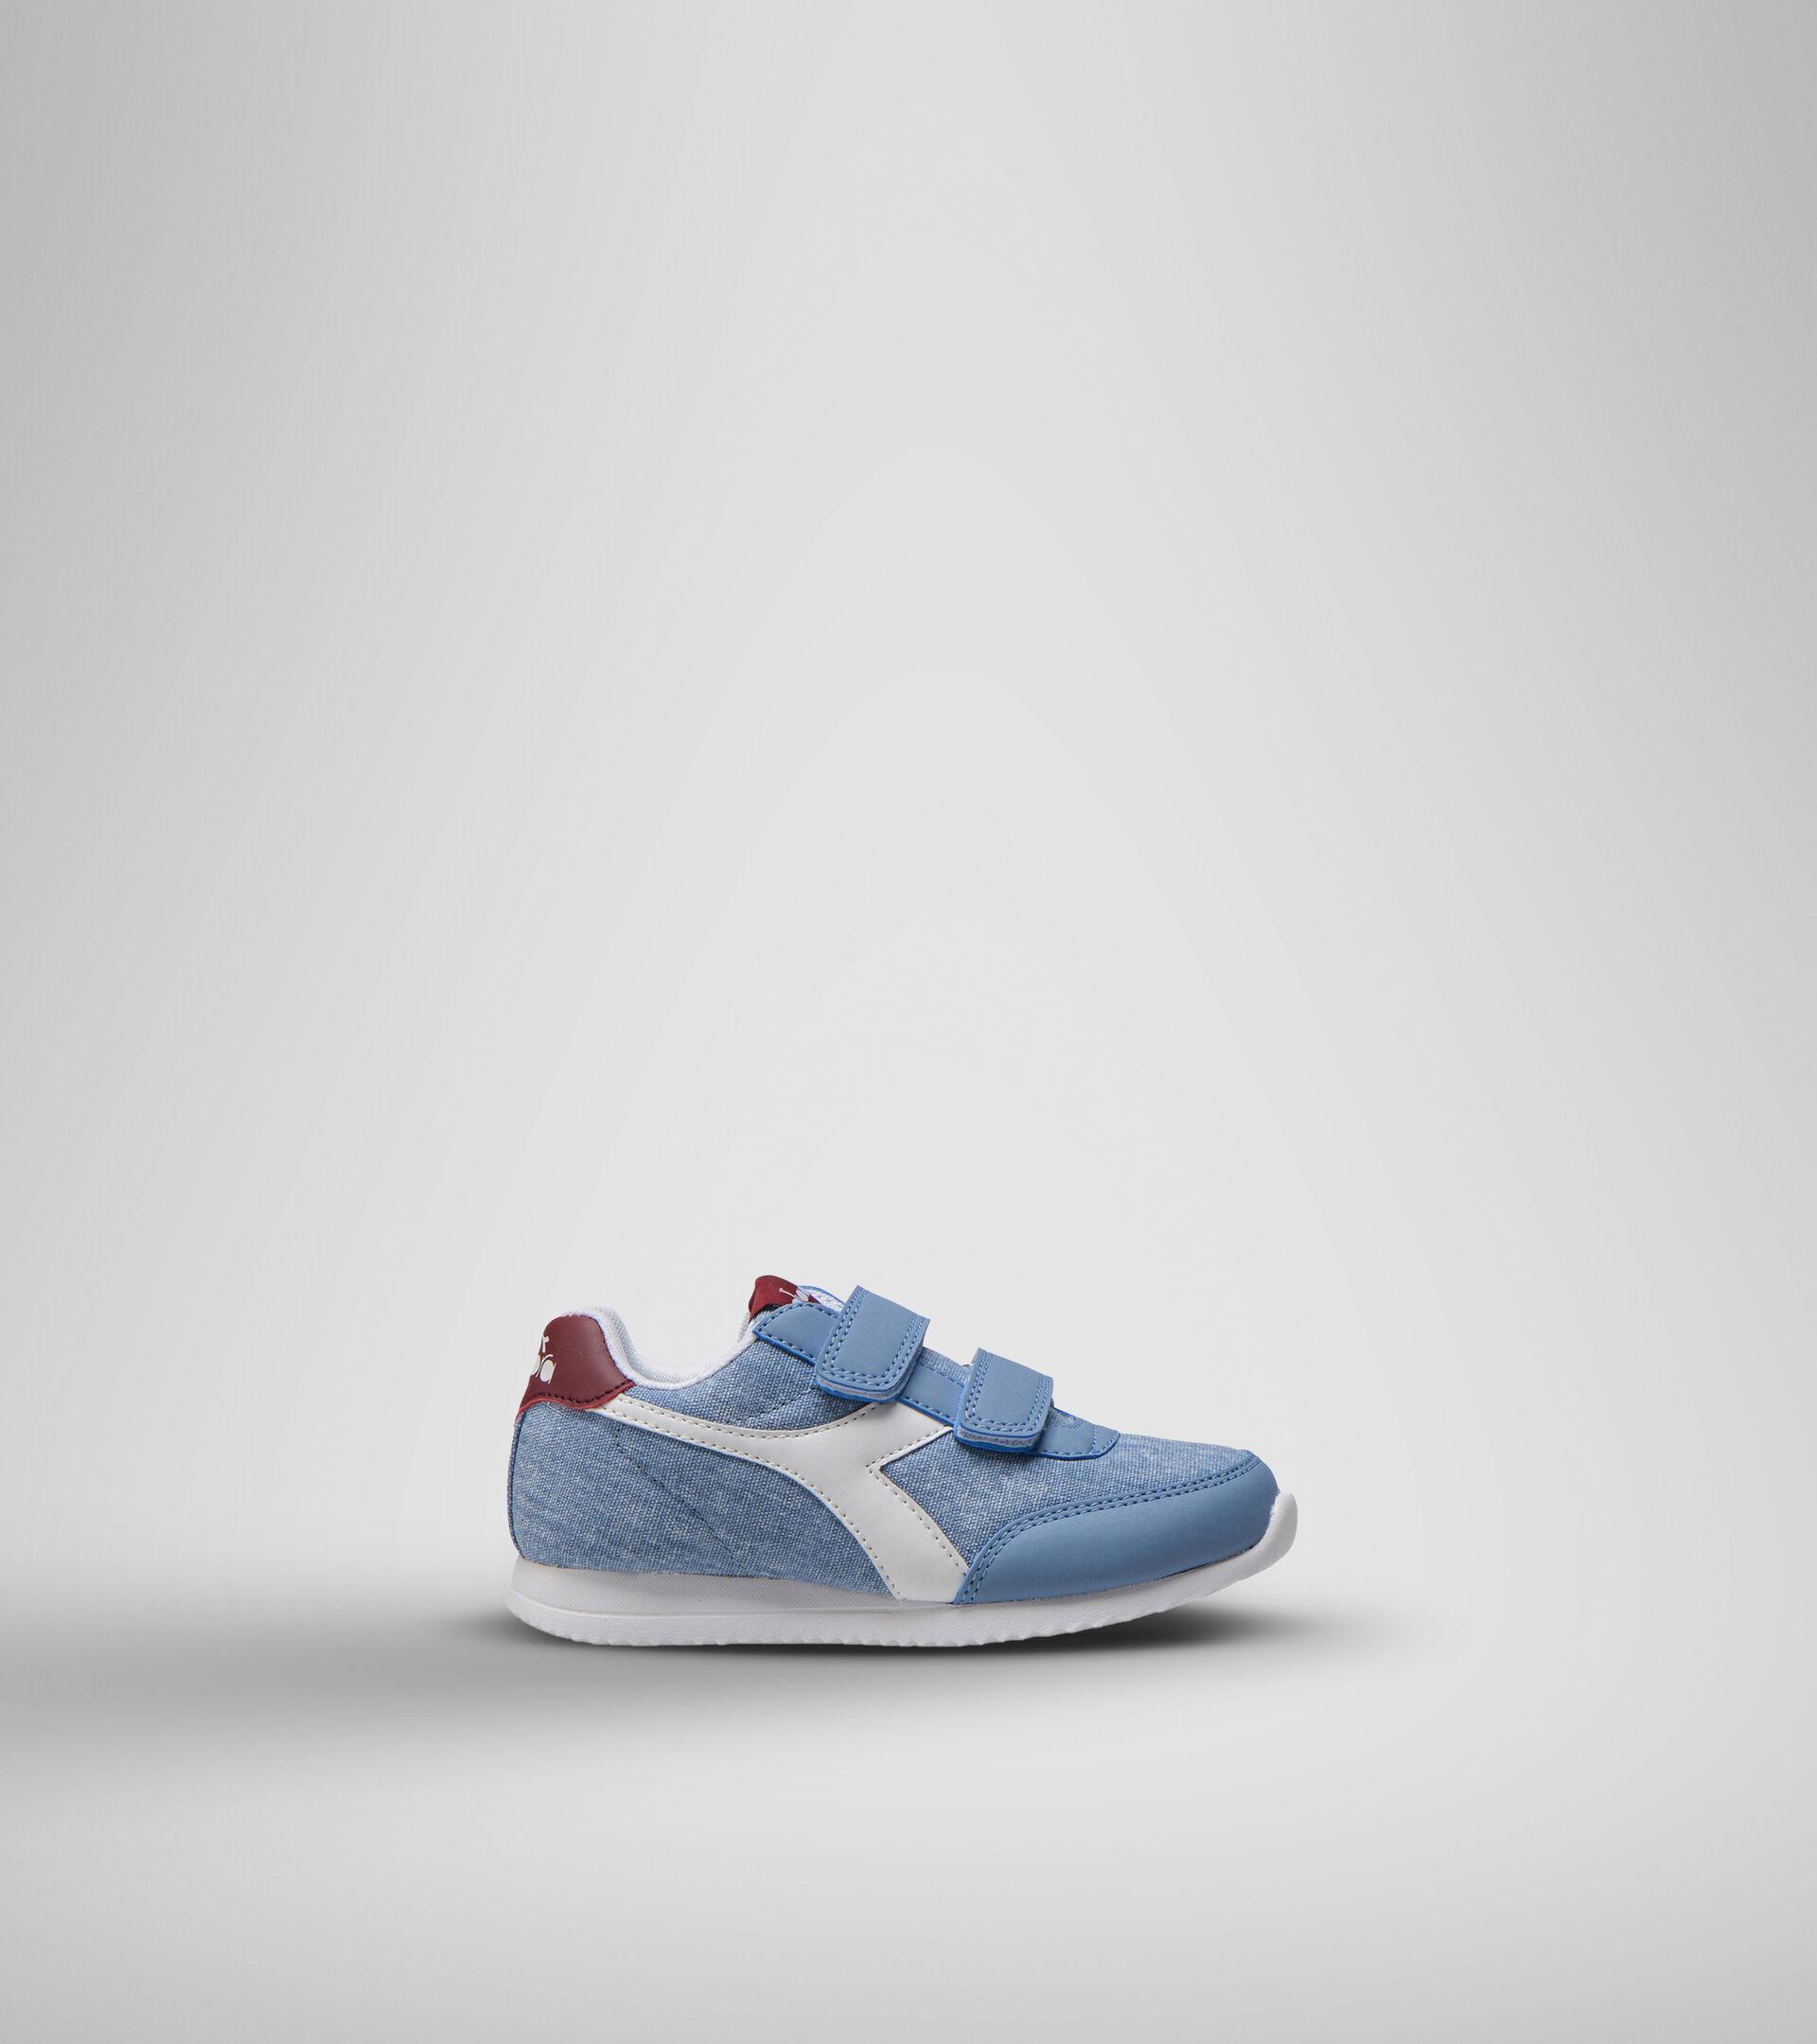 Footwear Sport BAMBINO JOG LIGHT PS TELA VACQUERA DESTENIDO/ZINFAN Diadora